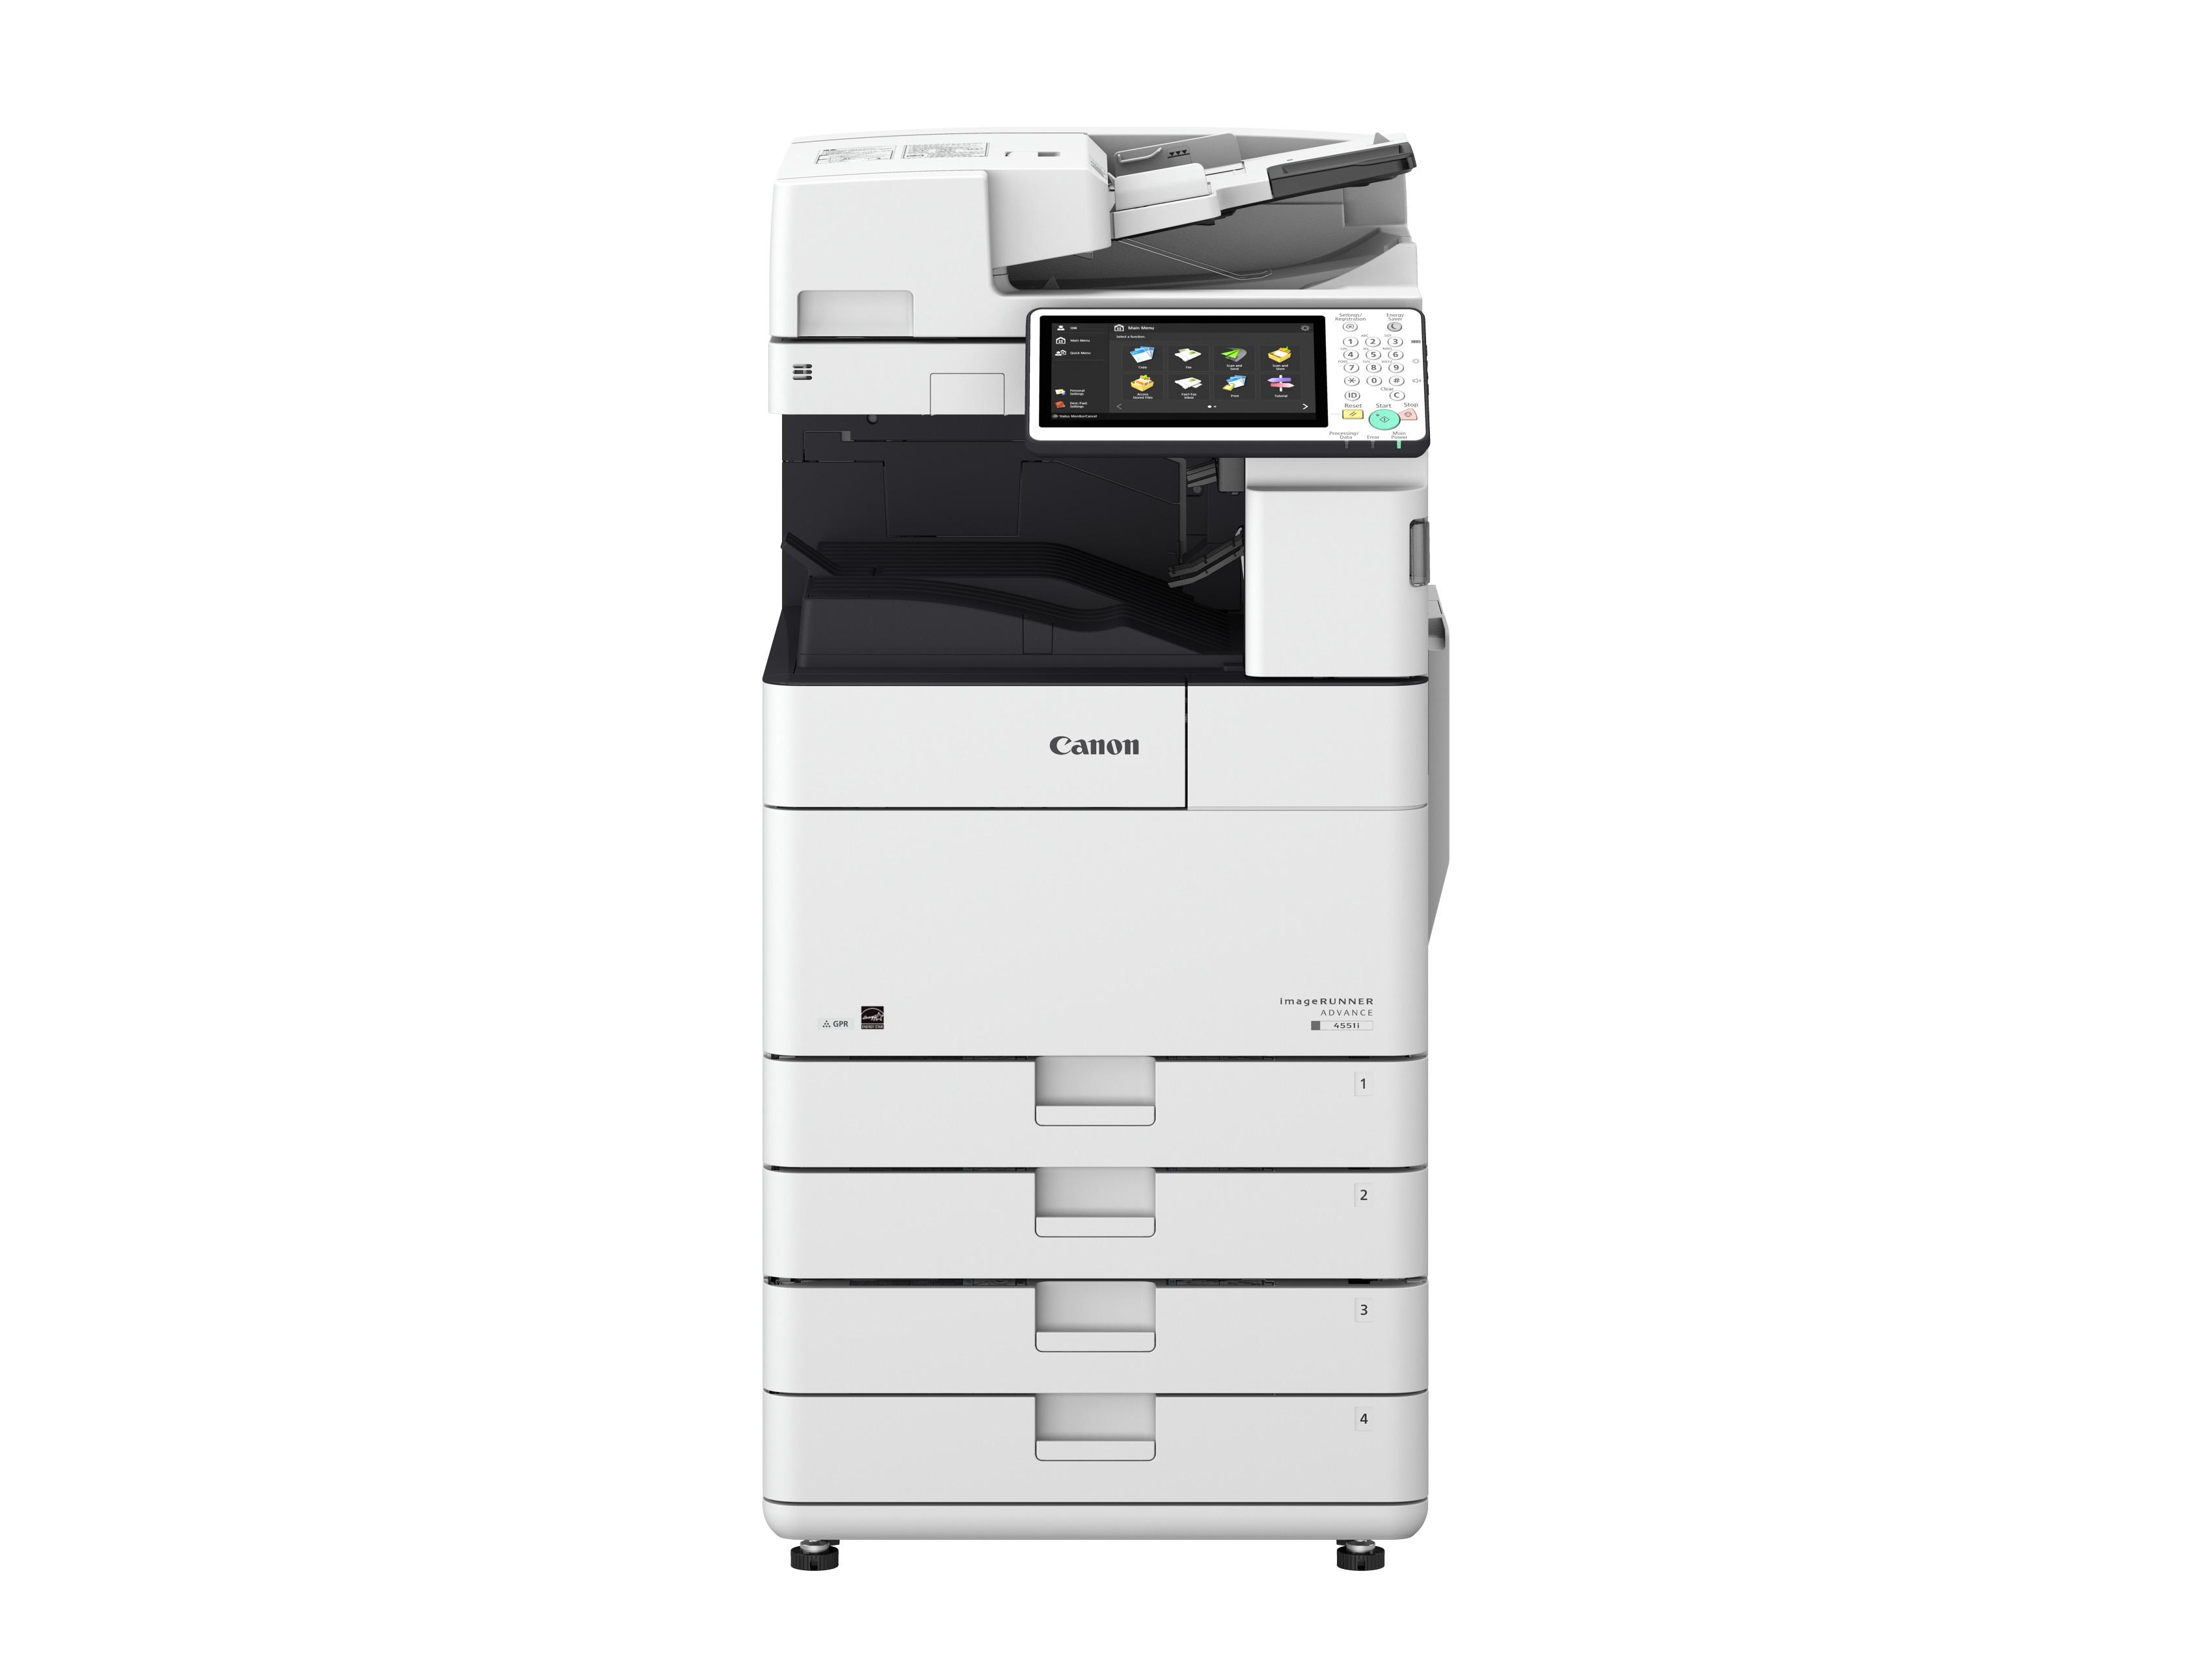 CANON - ImageRUNNER Advance 4500 Series - Multifuncionales Avanzados para Áreas de Oficina